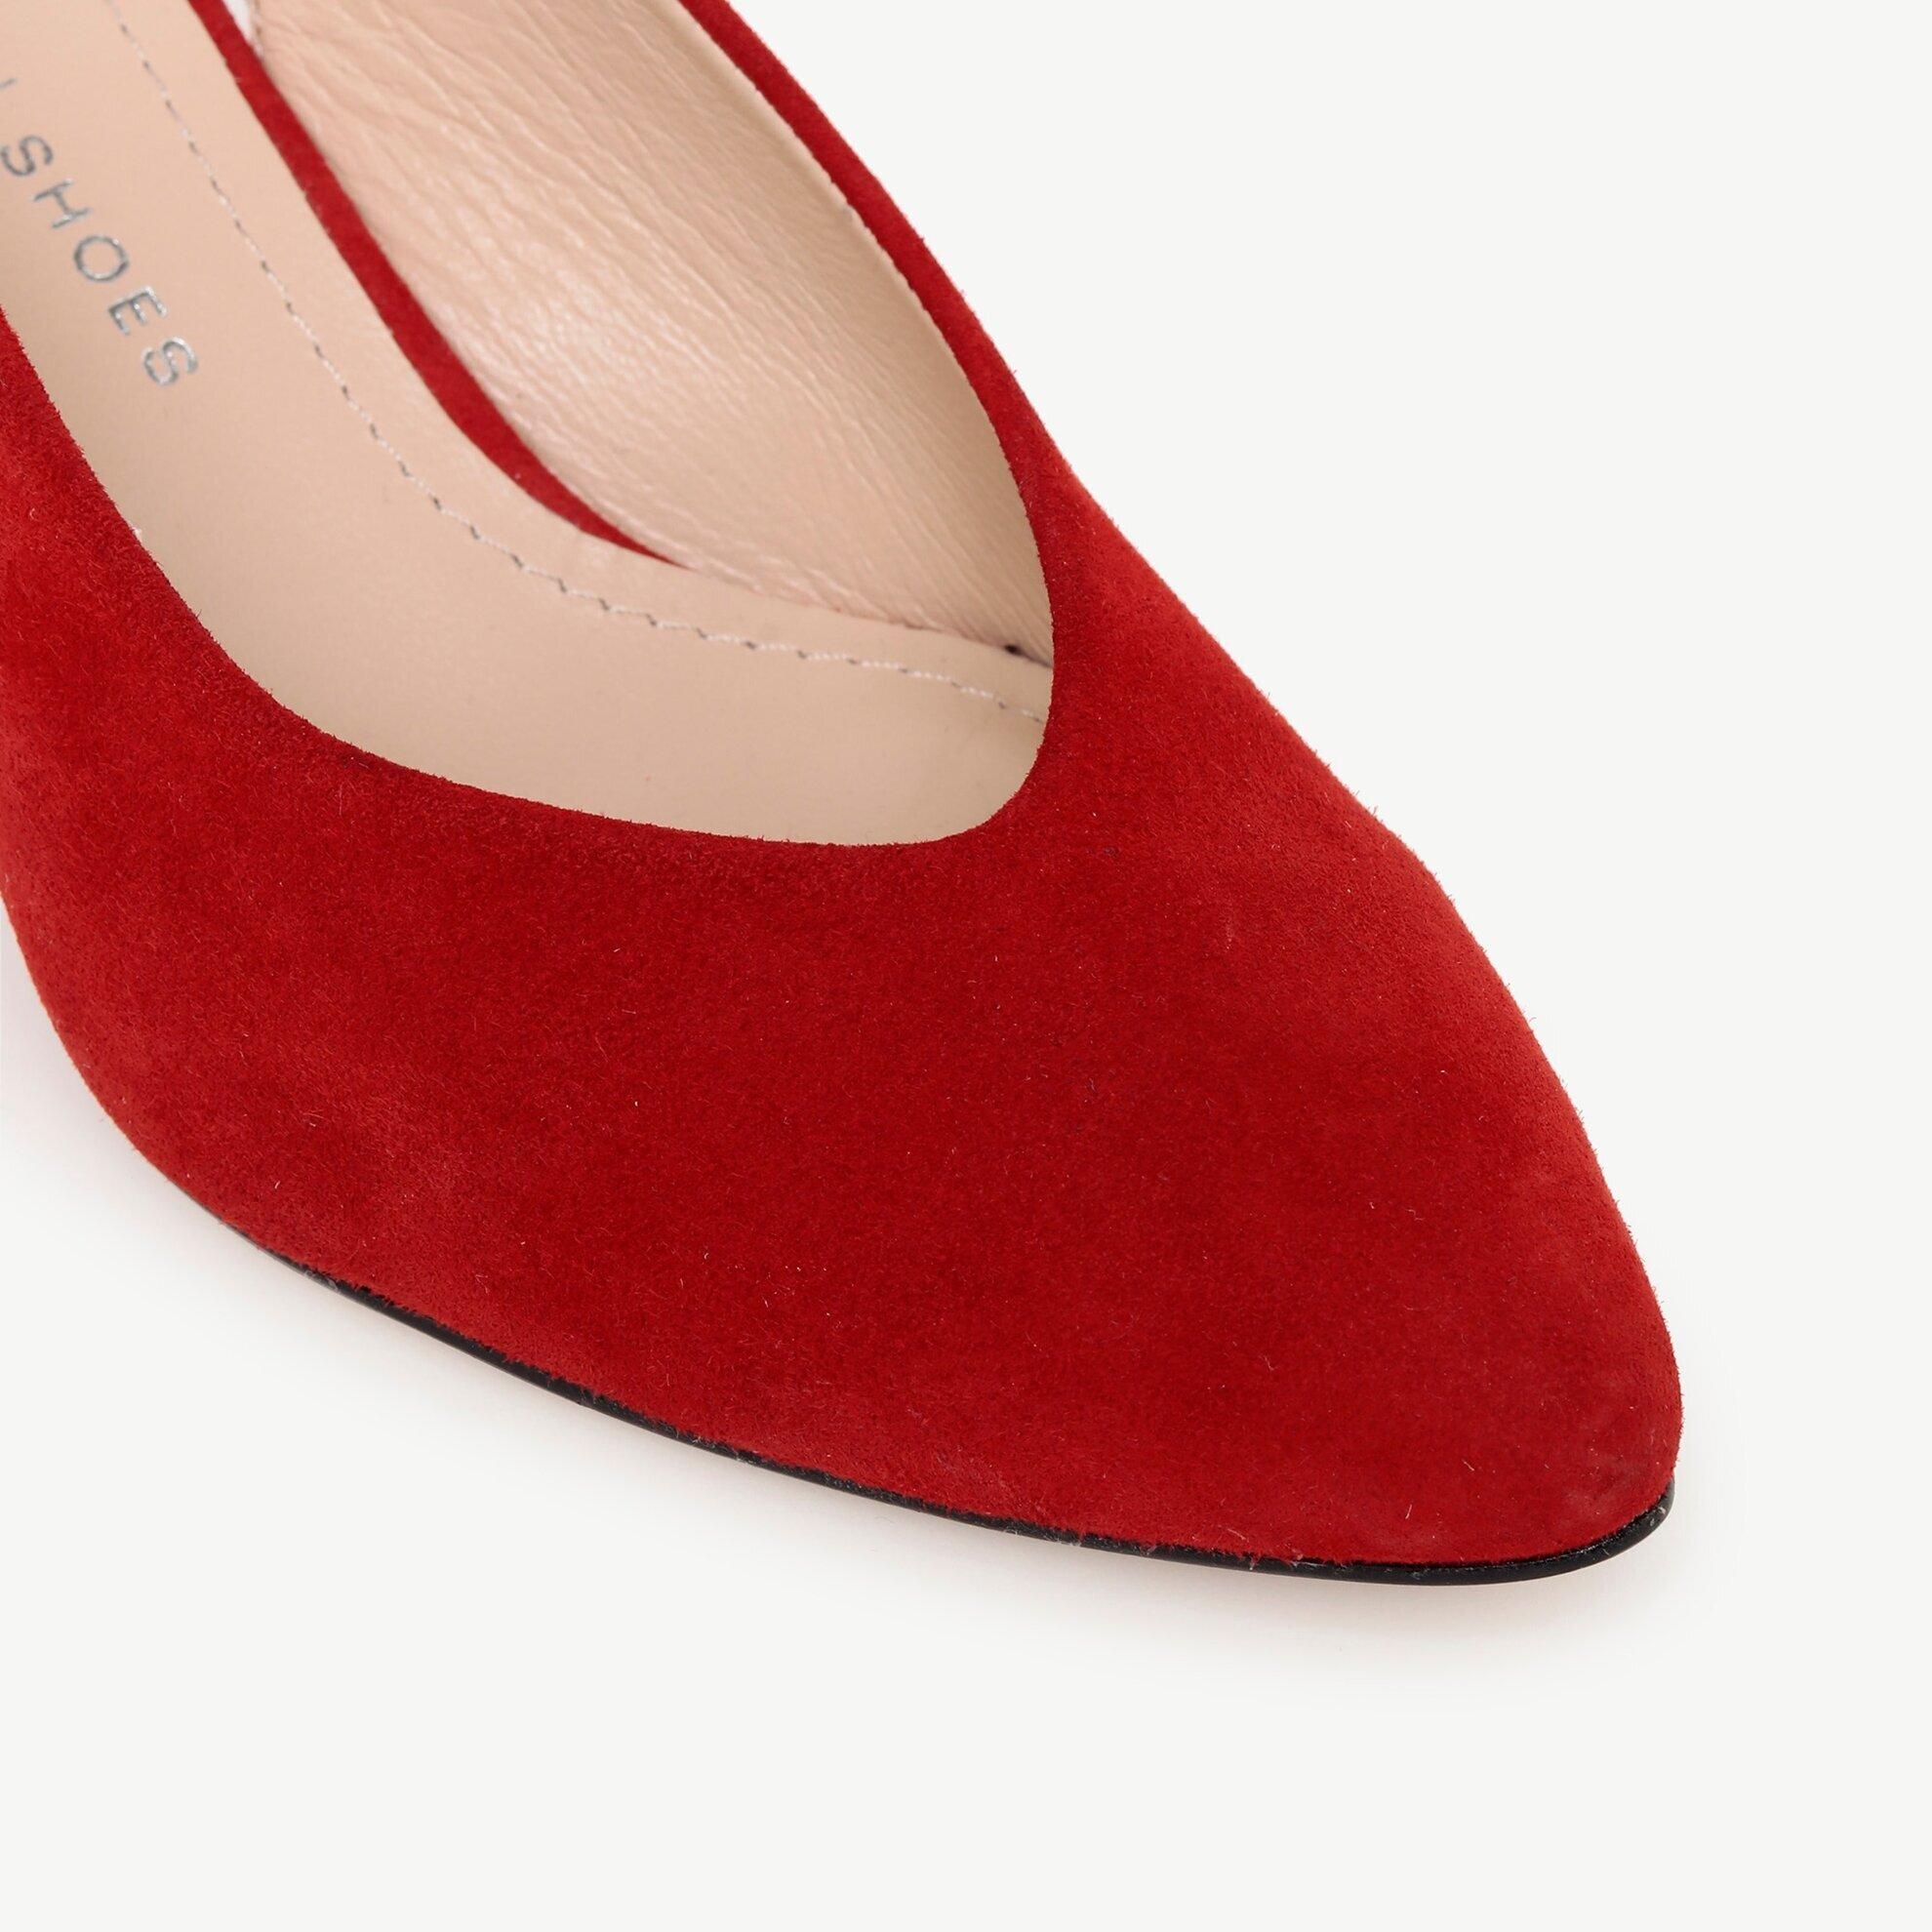 Topuklu Süet Ayakkabı